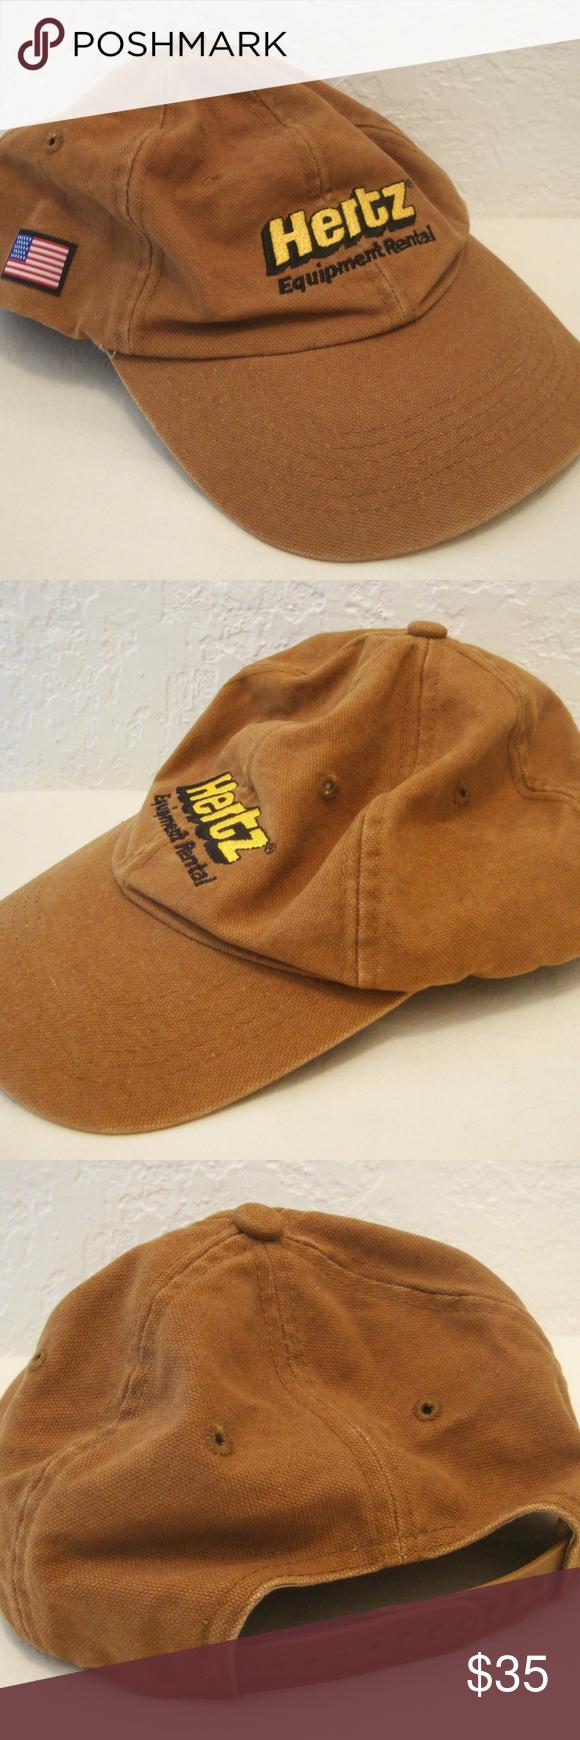 Hertz Equipment Rental Trucker Cap Tan Canvas Hat Trucker Cap Canvas Hat Black Logo